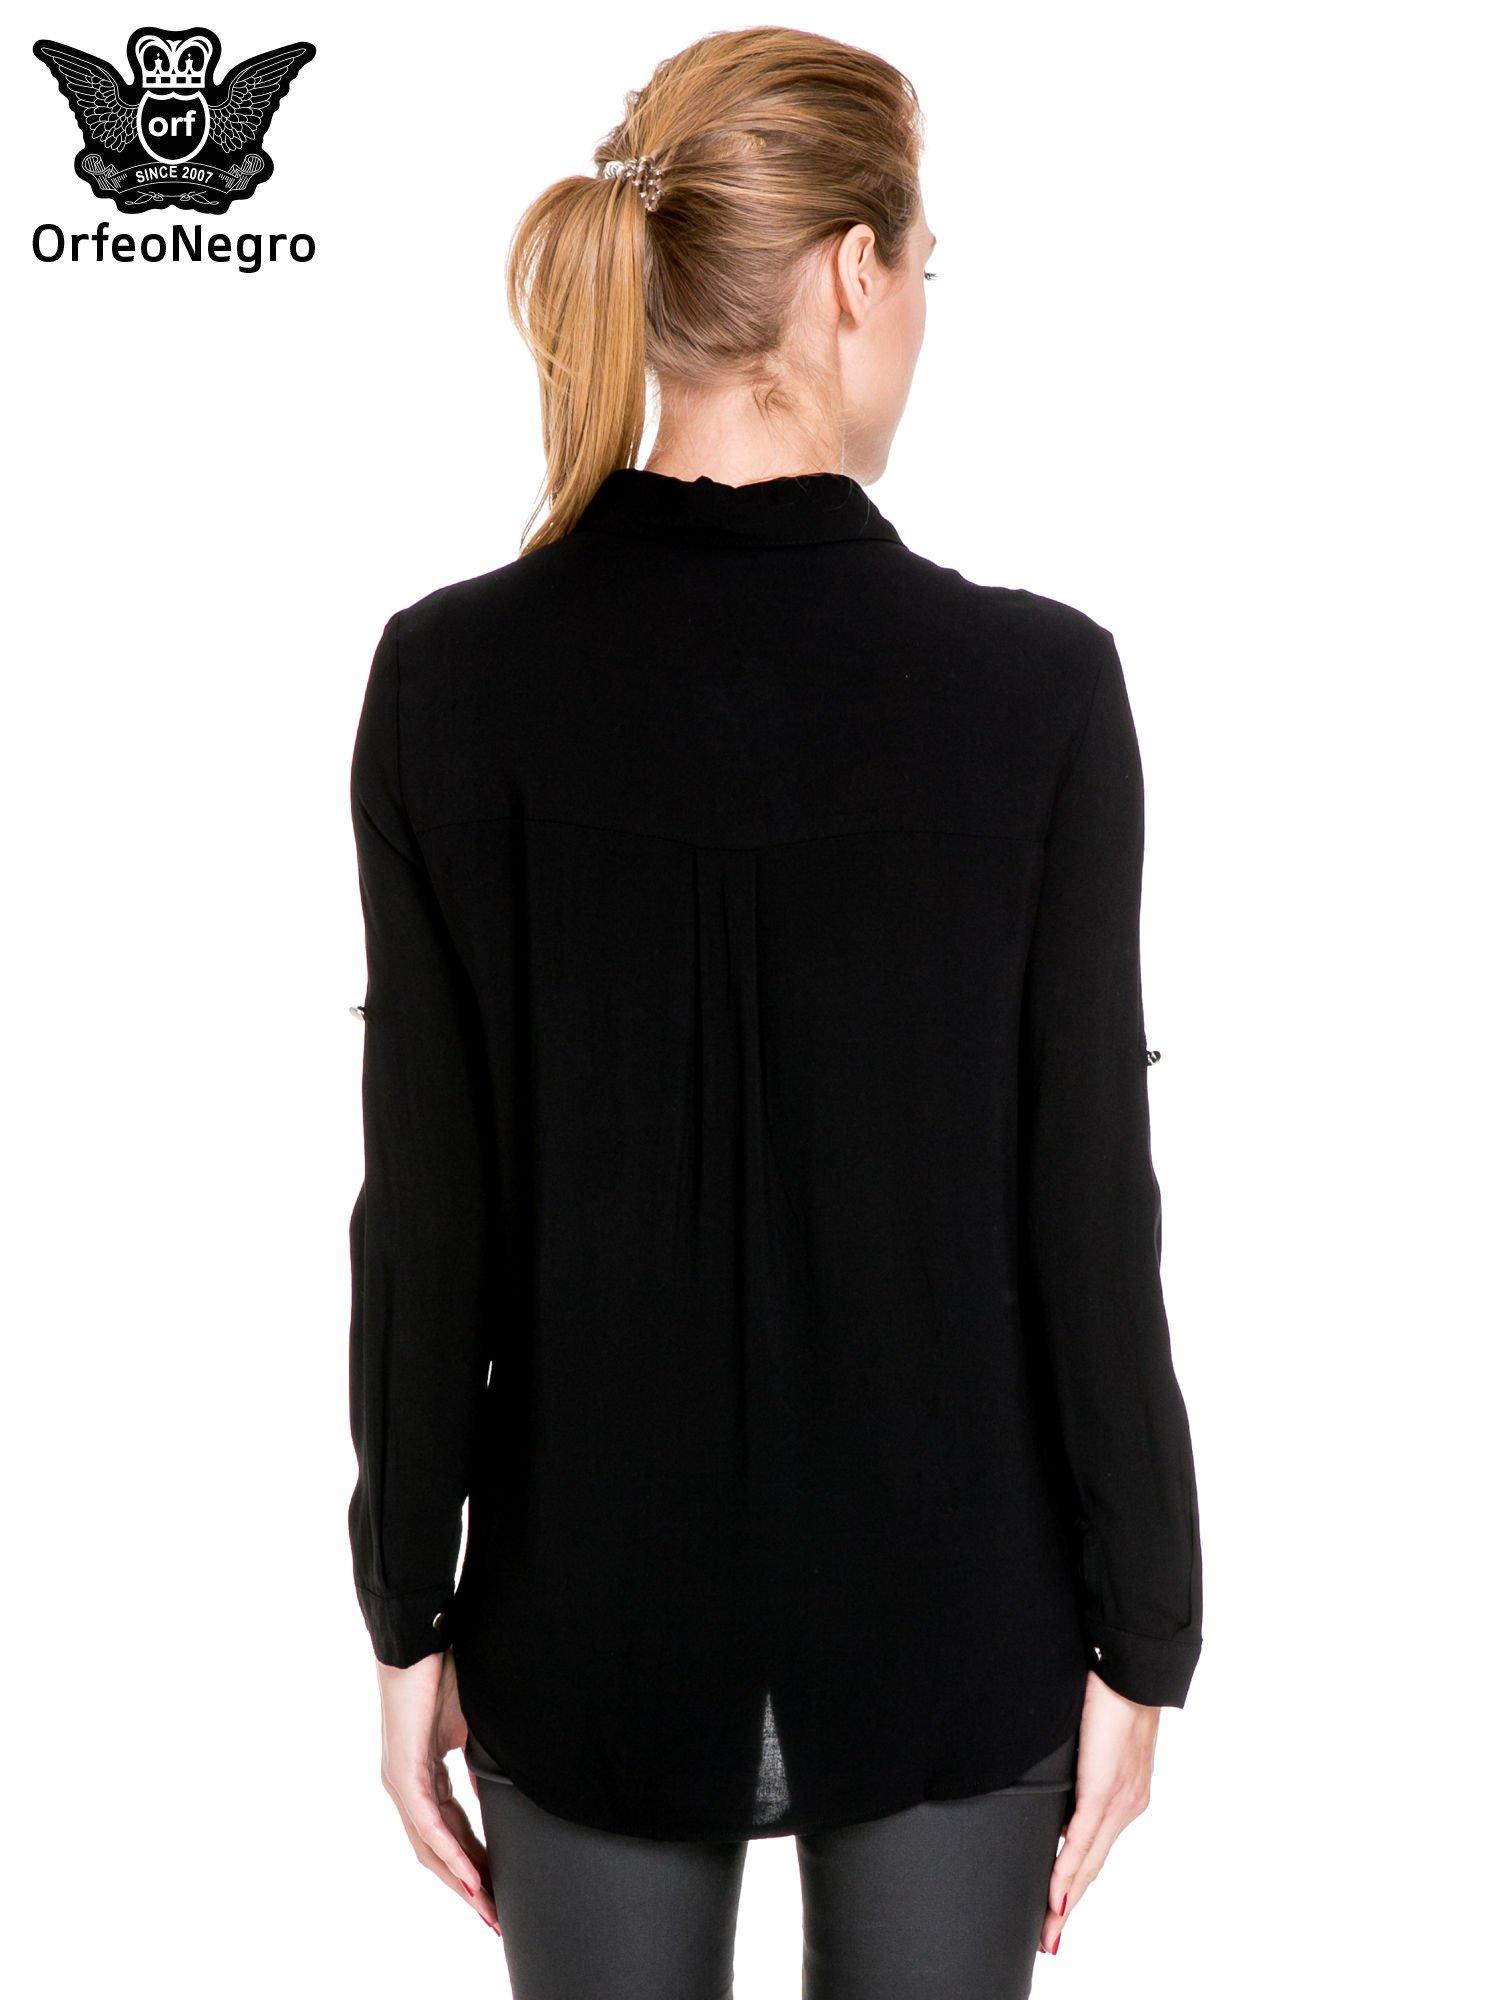 Czarna elegancka koszula z suwakami i napami                                  zdj.                                  4